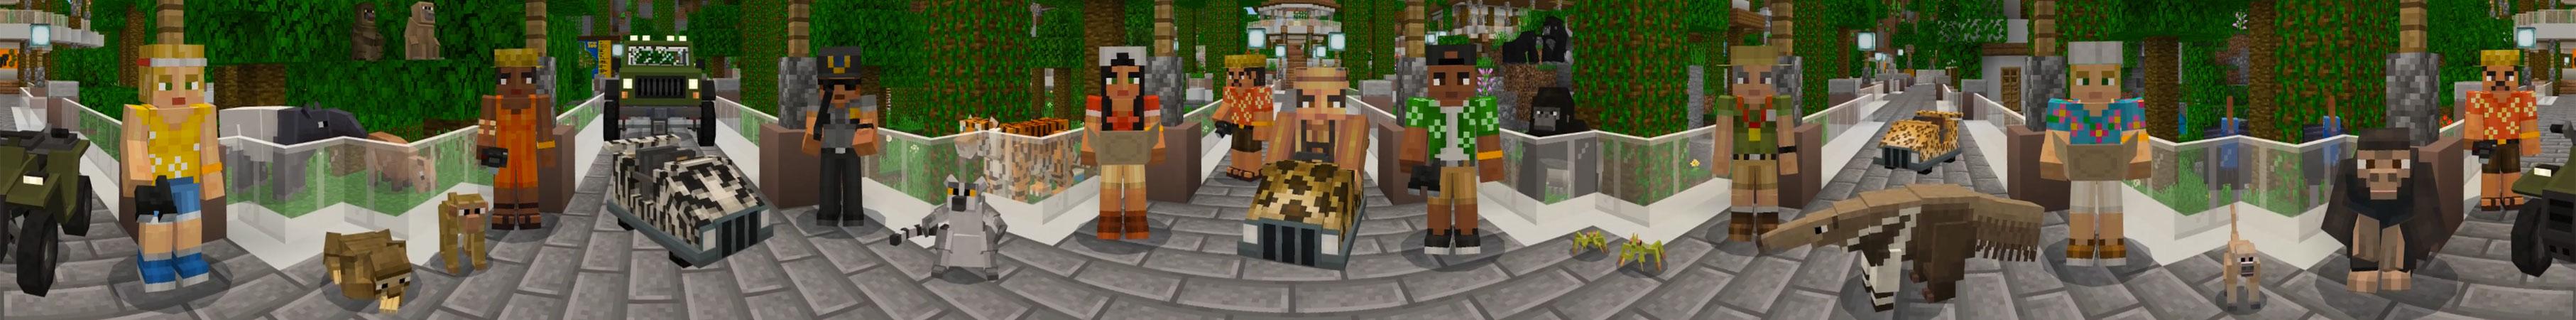 Jungle Zoo by PixelHeads - Minecraft Marketplace